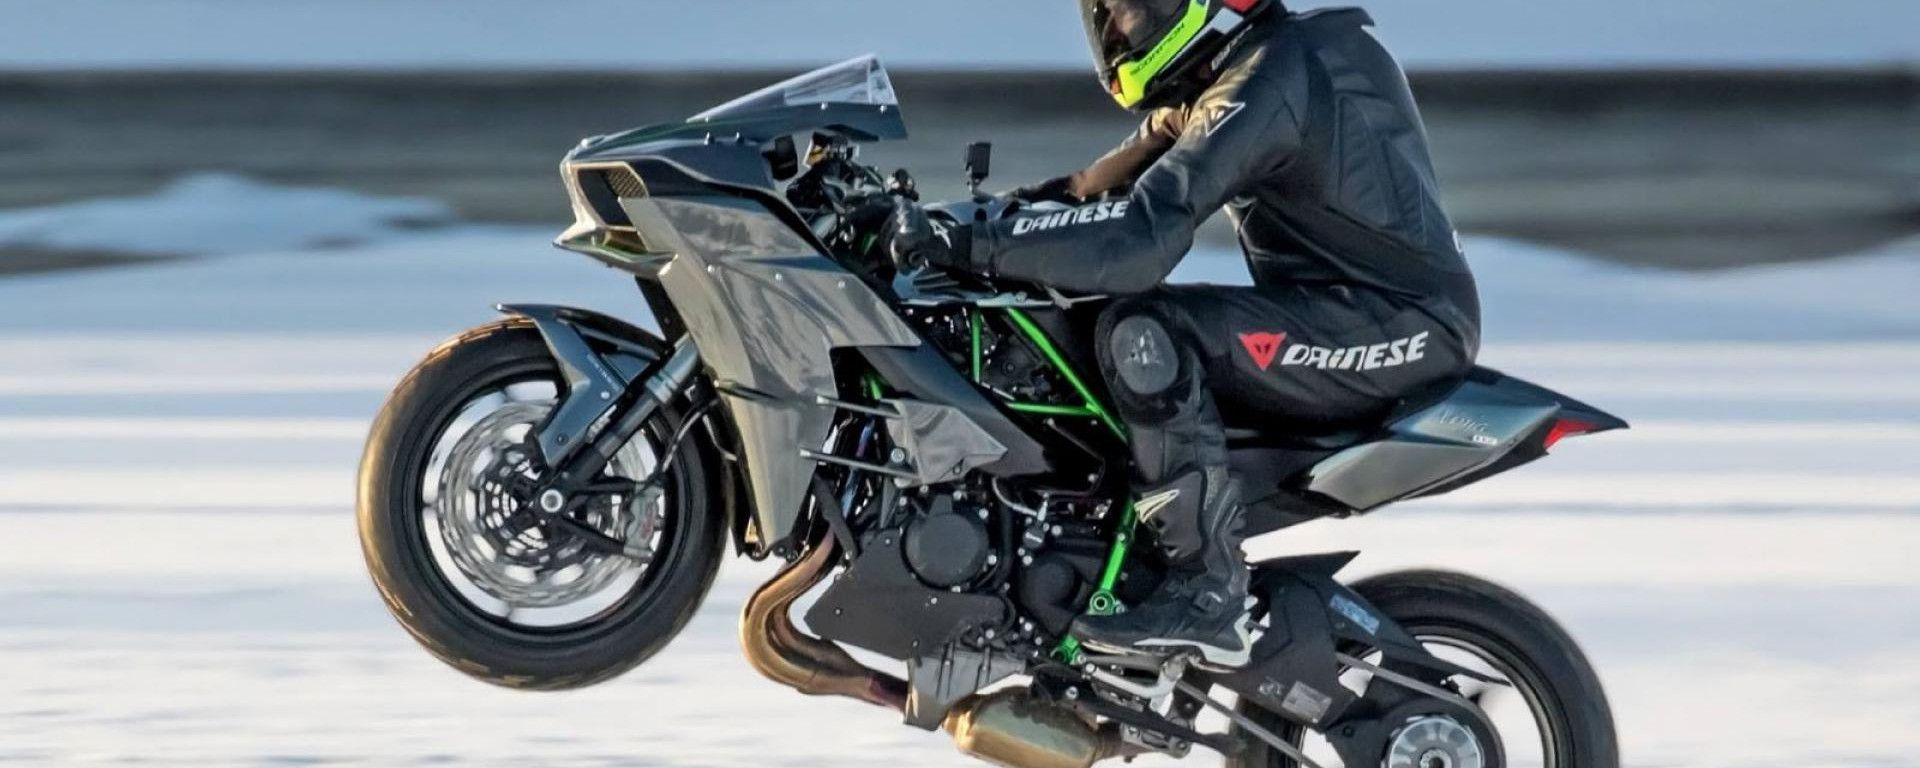 Kawasaki Ninja H2: 231 CV non dovrebbero rendere difficili i monoruota